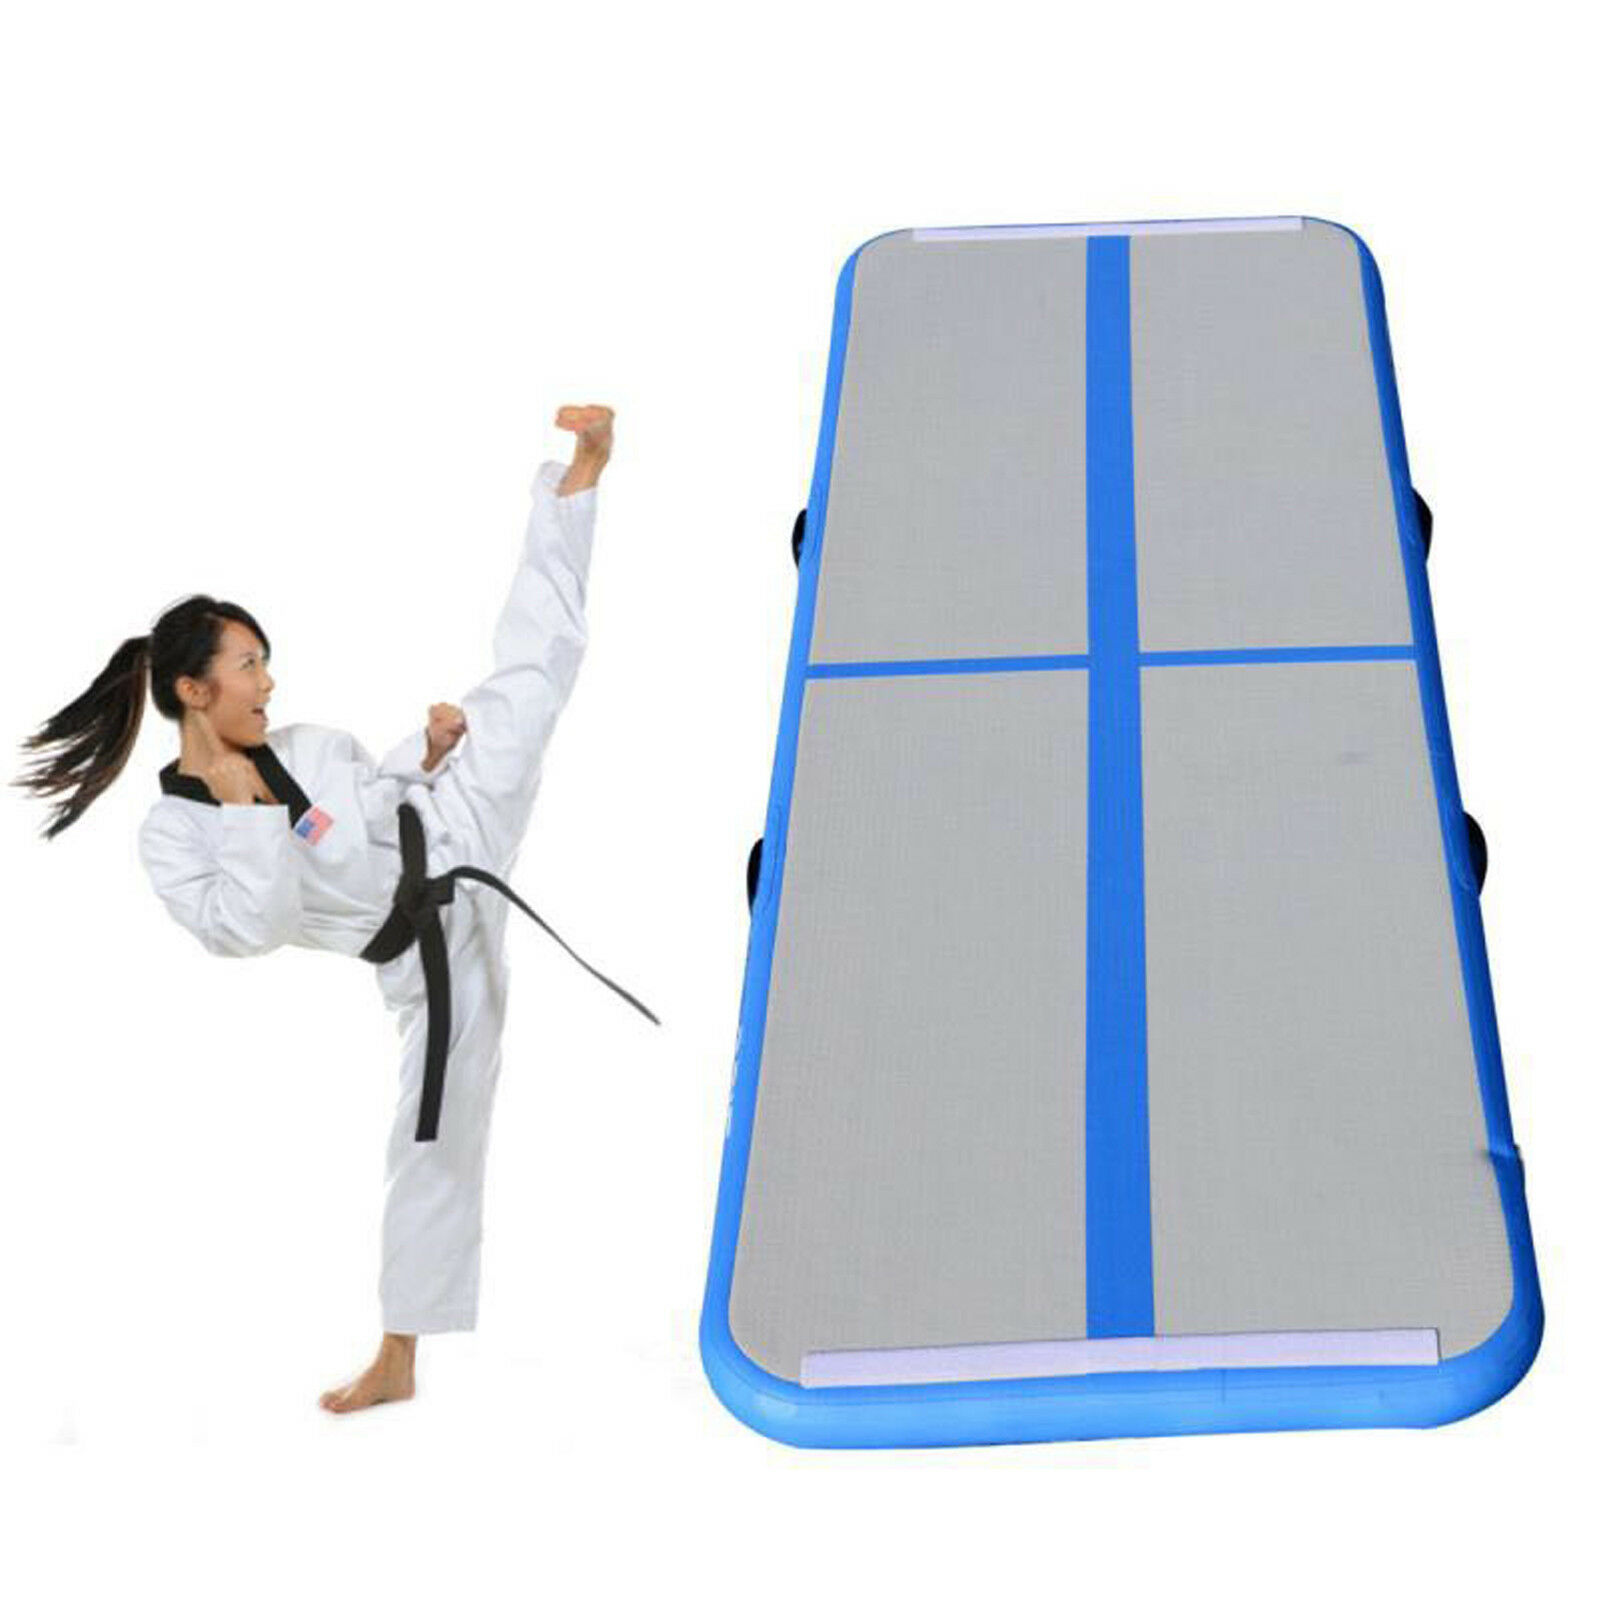 athletic board mats z spring gymnastics preschool my making training used pin equipment